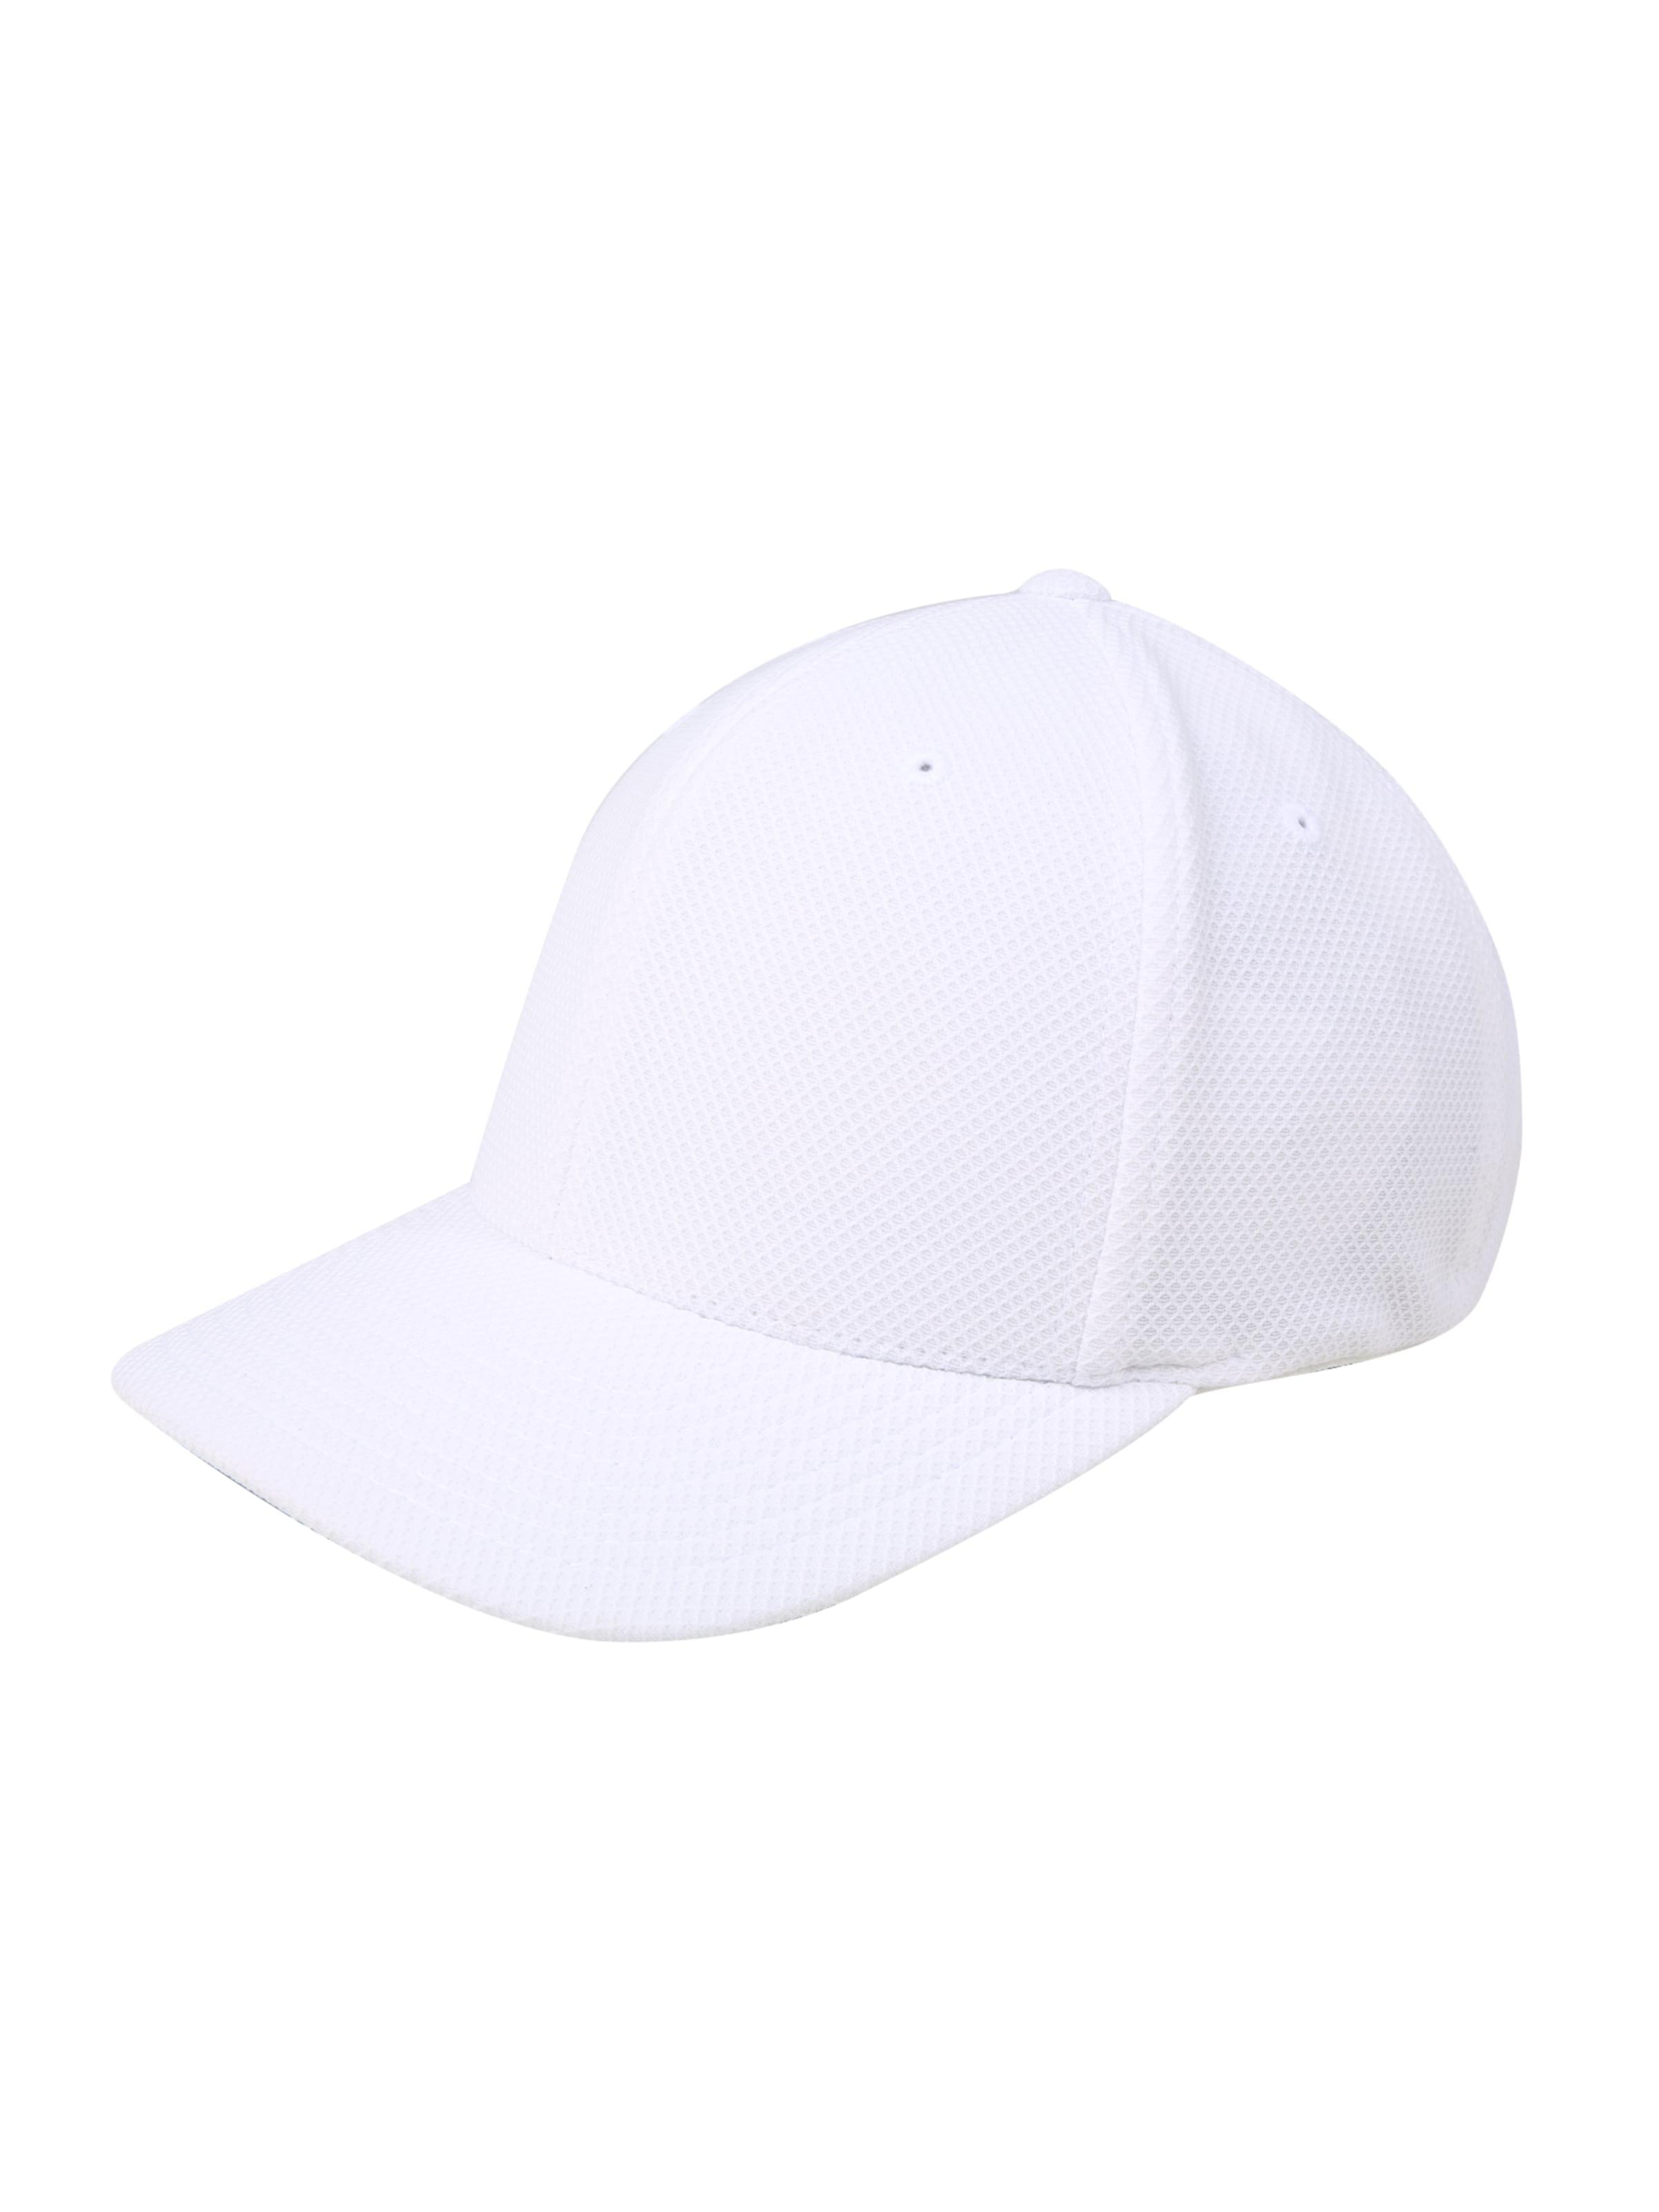 Hybrid' Weiß Flexfit '110 Cap Velcro In kZiOPXu